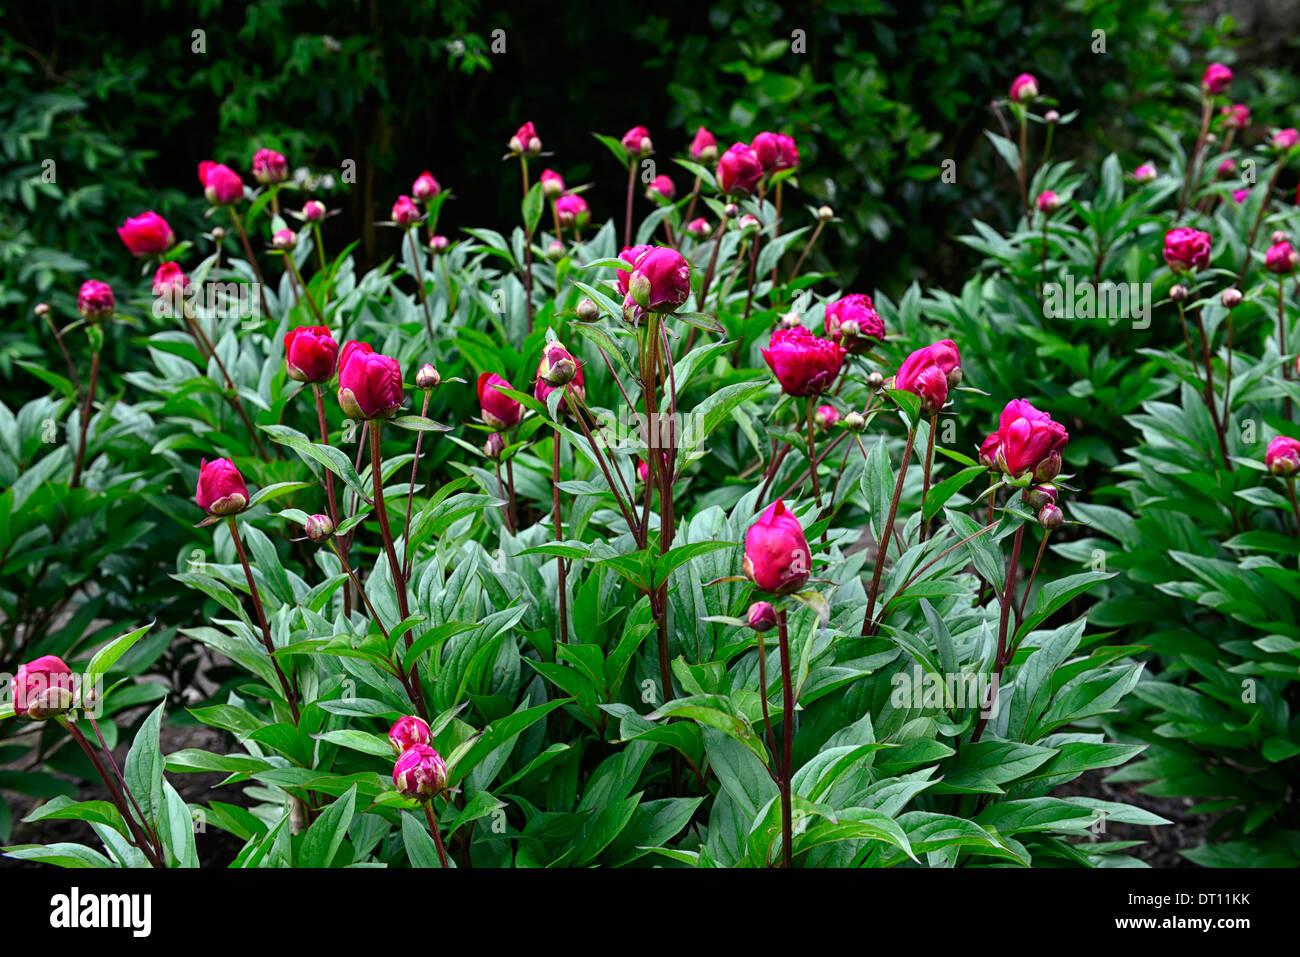 Paeonia officinalis rubra plena peony peonies pink red for Paeonia officinalis